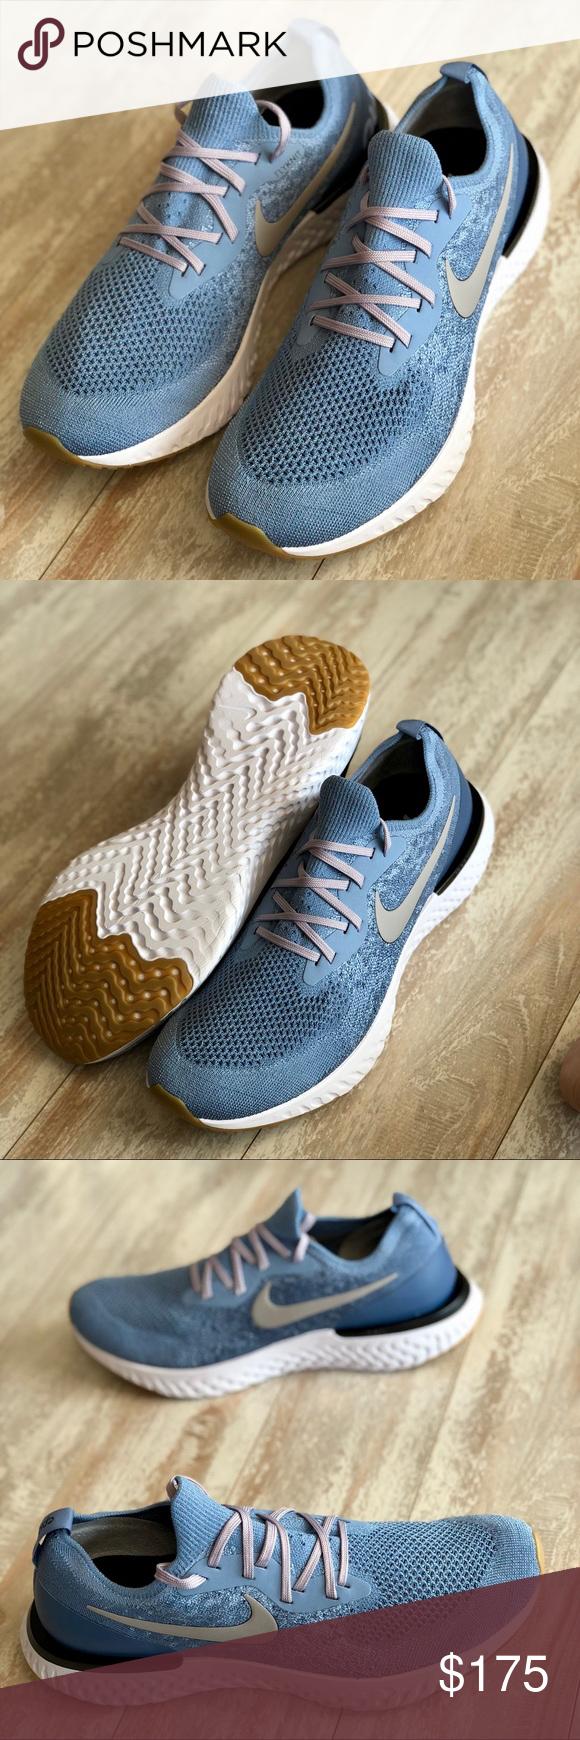 bccff8e955444 NWT Nike ID Epic react Custom Blue Brand new no box